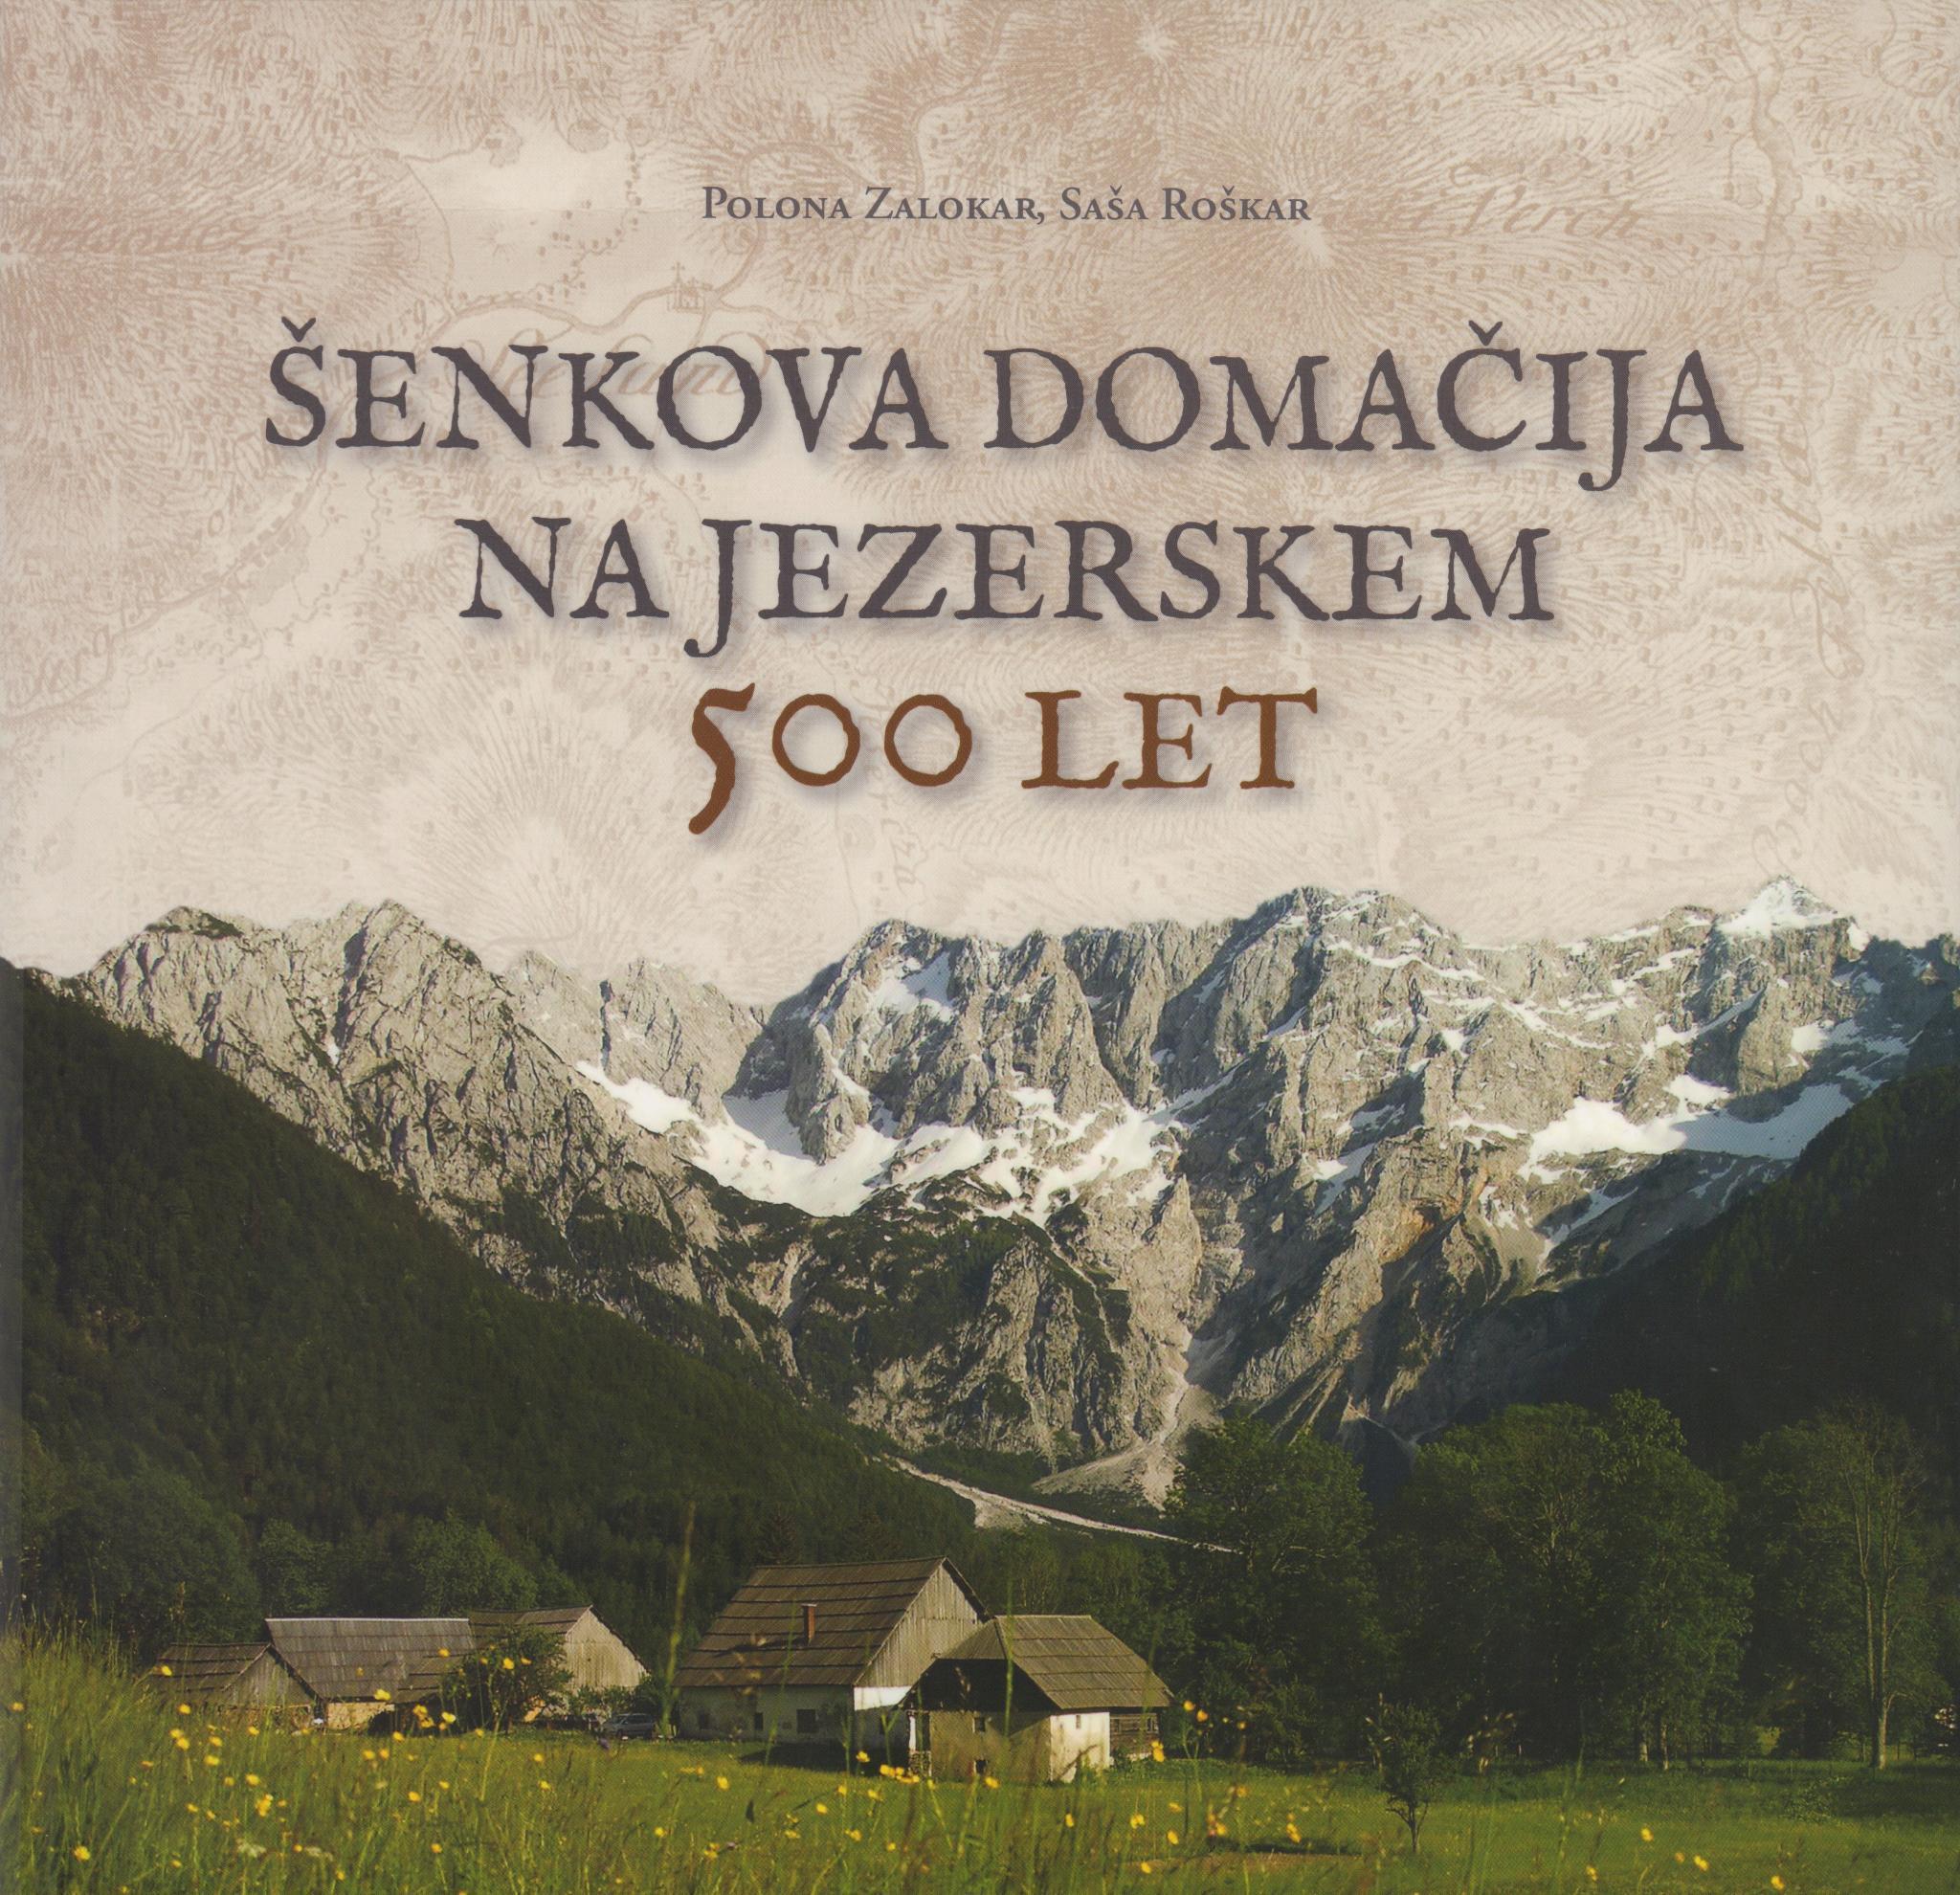 Šenkova domačija na Jezerskem, 500 let